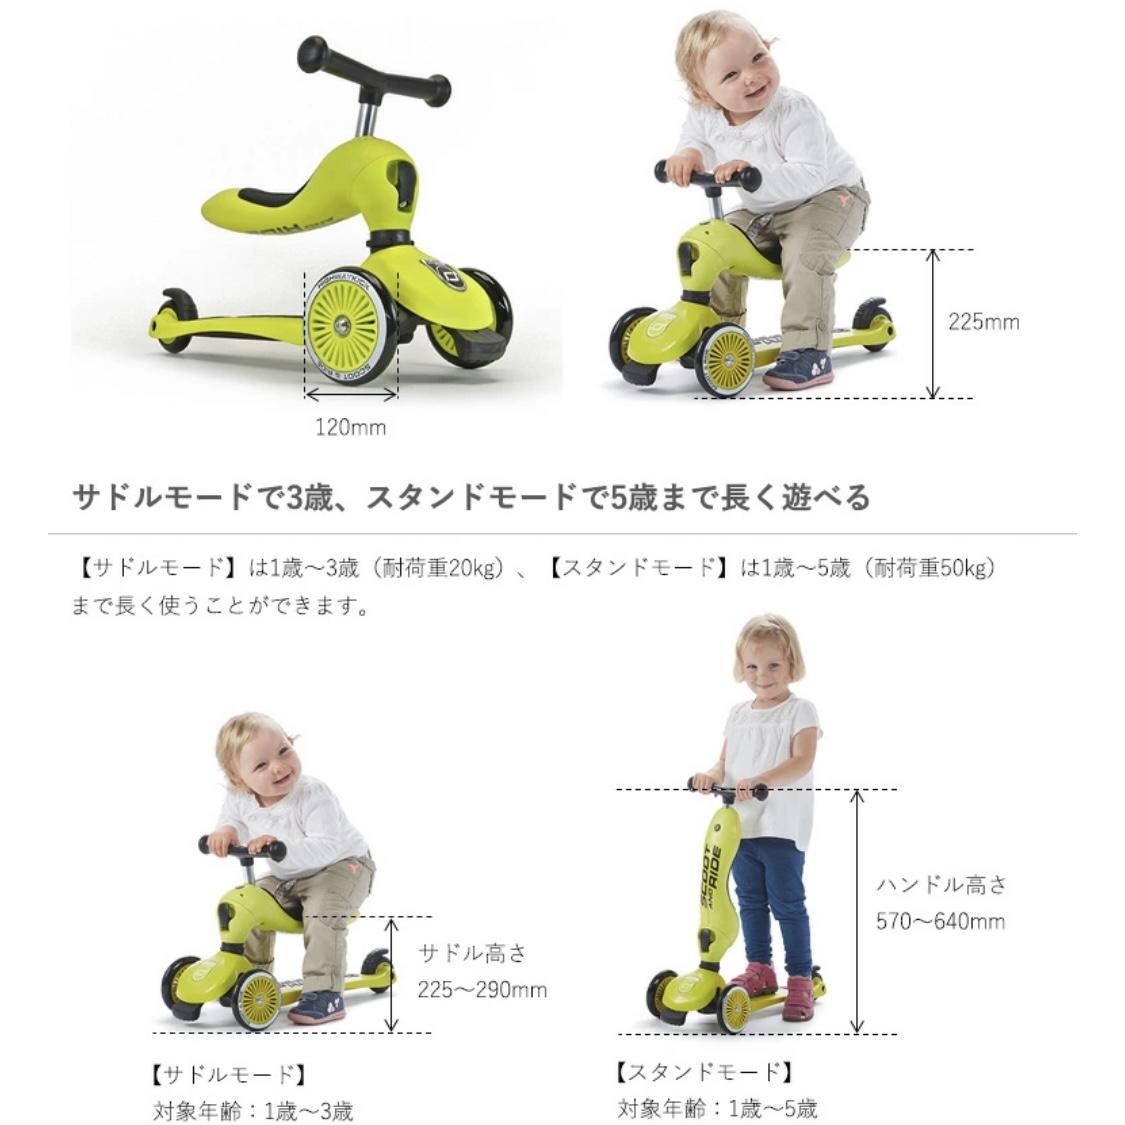 f:id:baby-alice:20210301120543j:plain